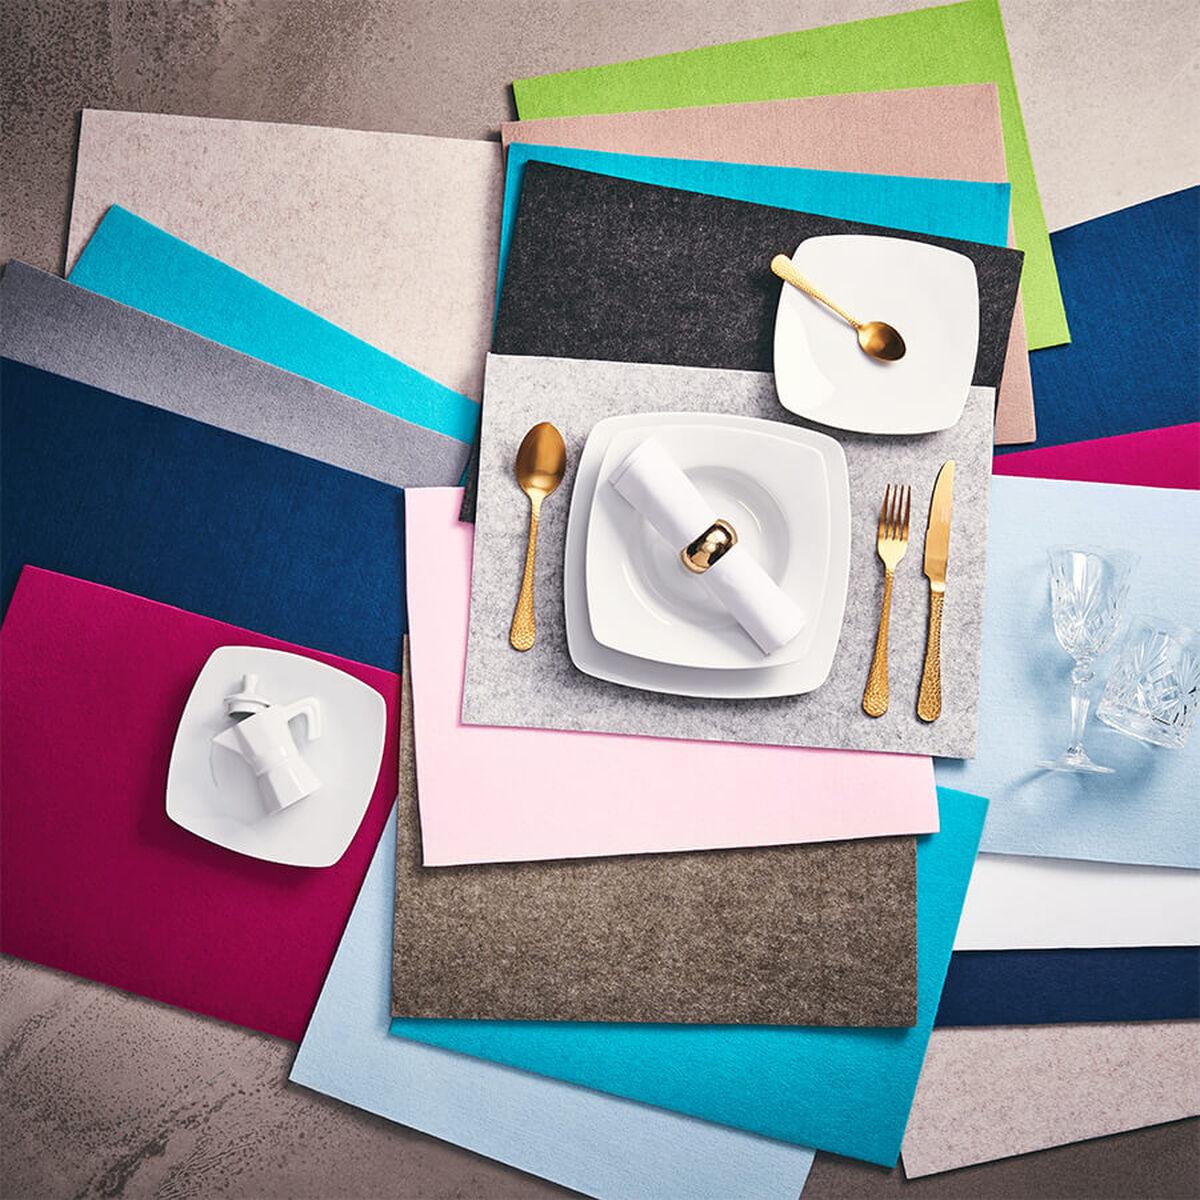 tischsets platzsets online kaufen butlers. Black Bedroom Furniture Sets. Home Design Ideas